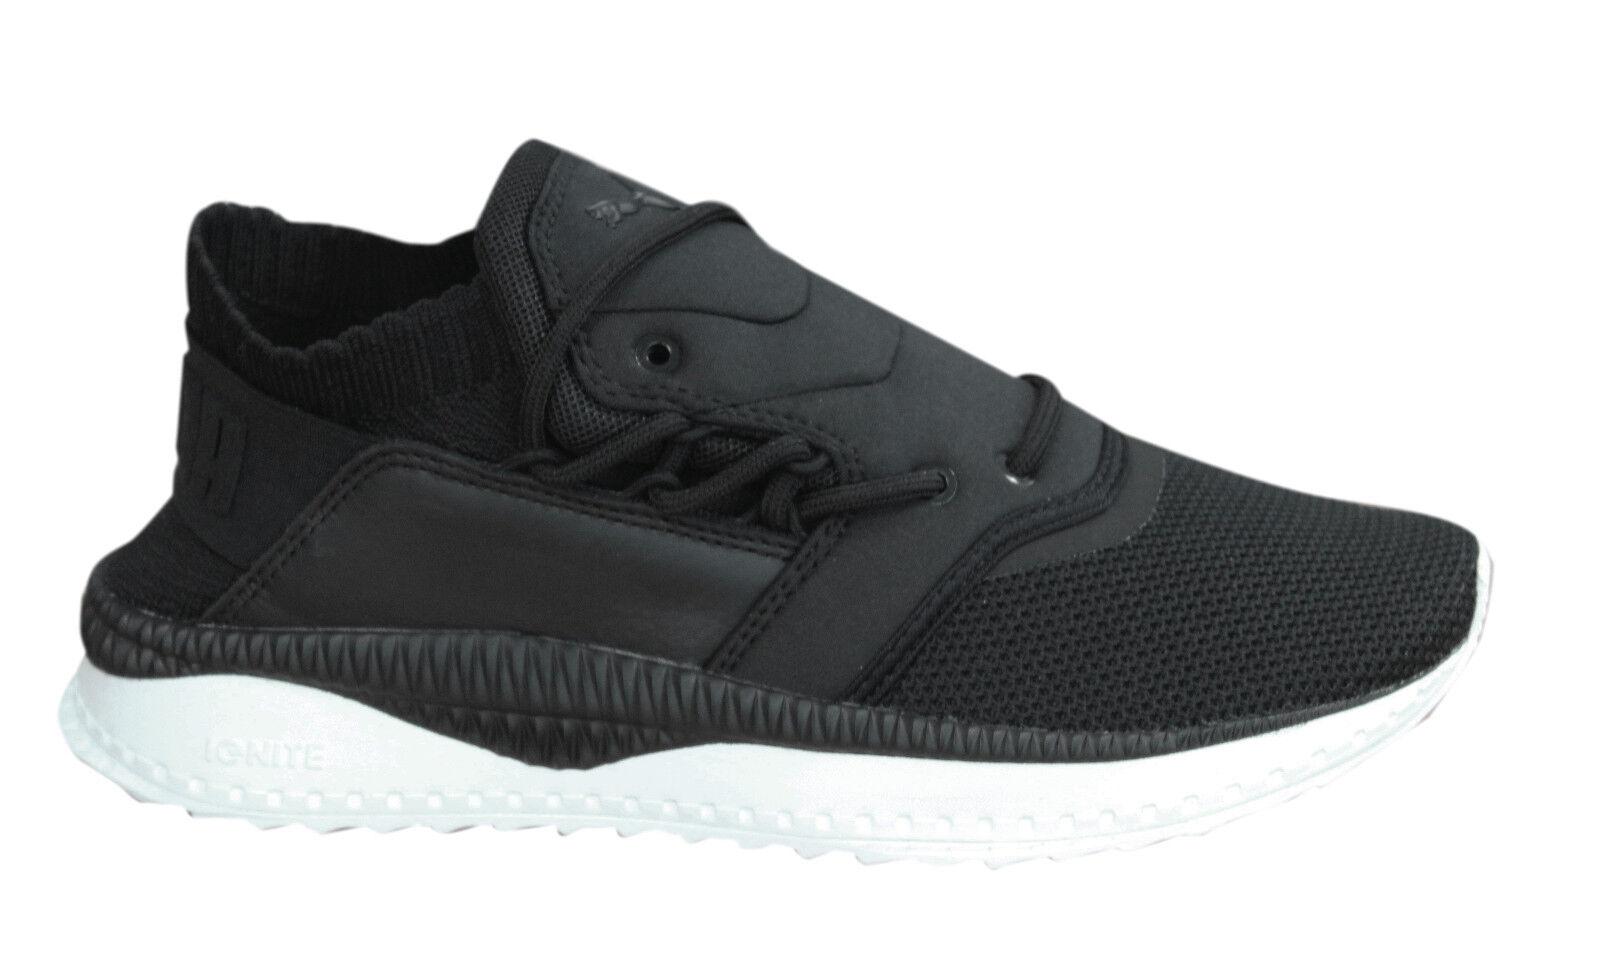 Puma TSUGI Shinsei Lace Up Black Textile Mens Trainers Shoes 363759 ... 9cb744b23